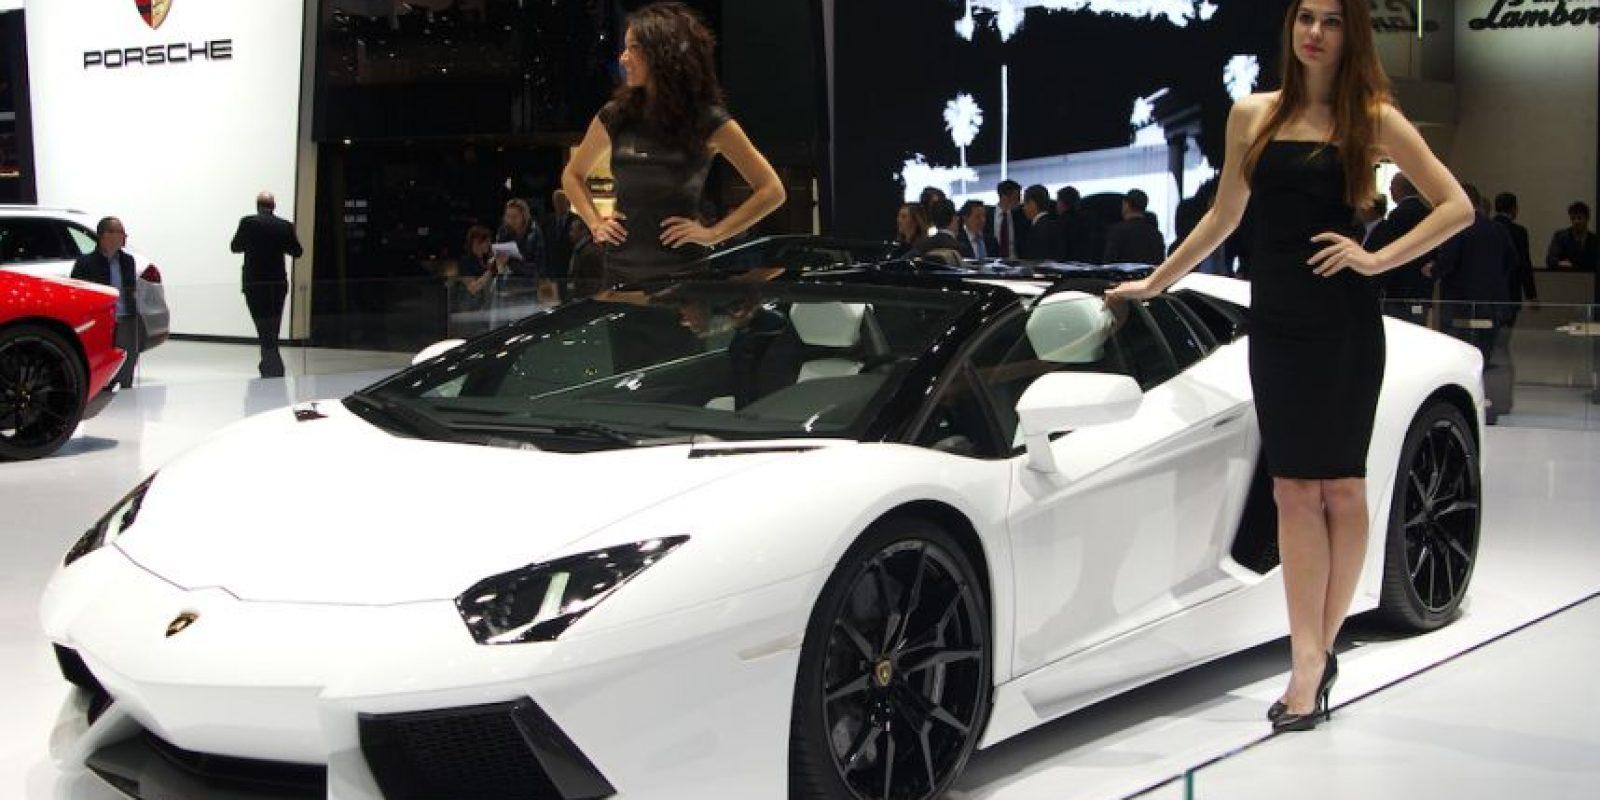 Este es el Lamborghini Aventador Foto:Wikimedia